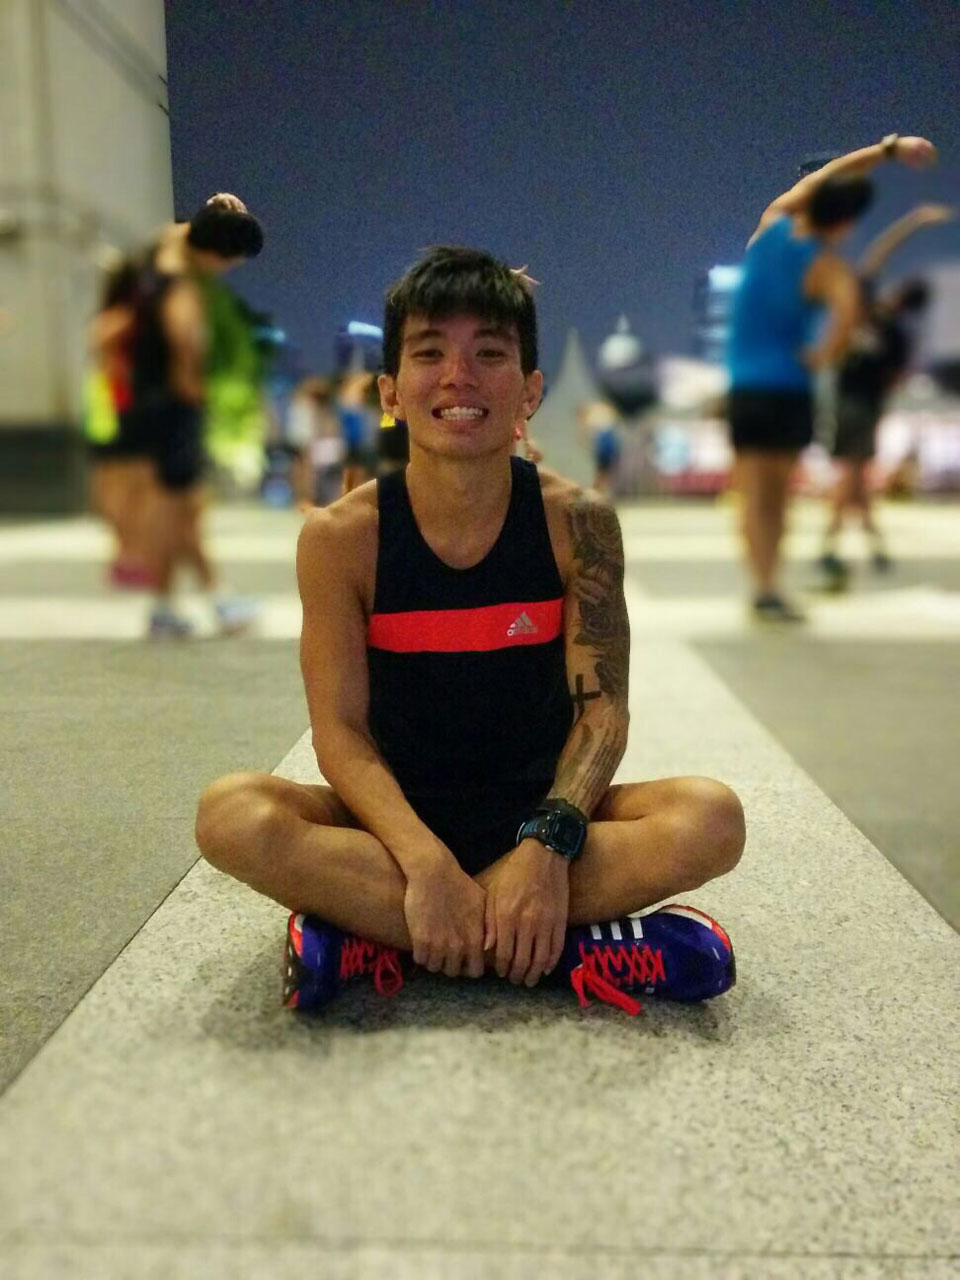 Hubert CJY: His Lofty Goal? Running a 3-Hour Full Marathon!